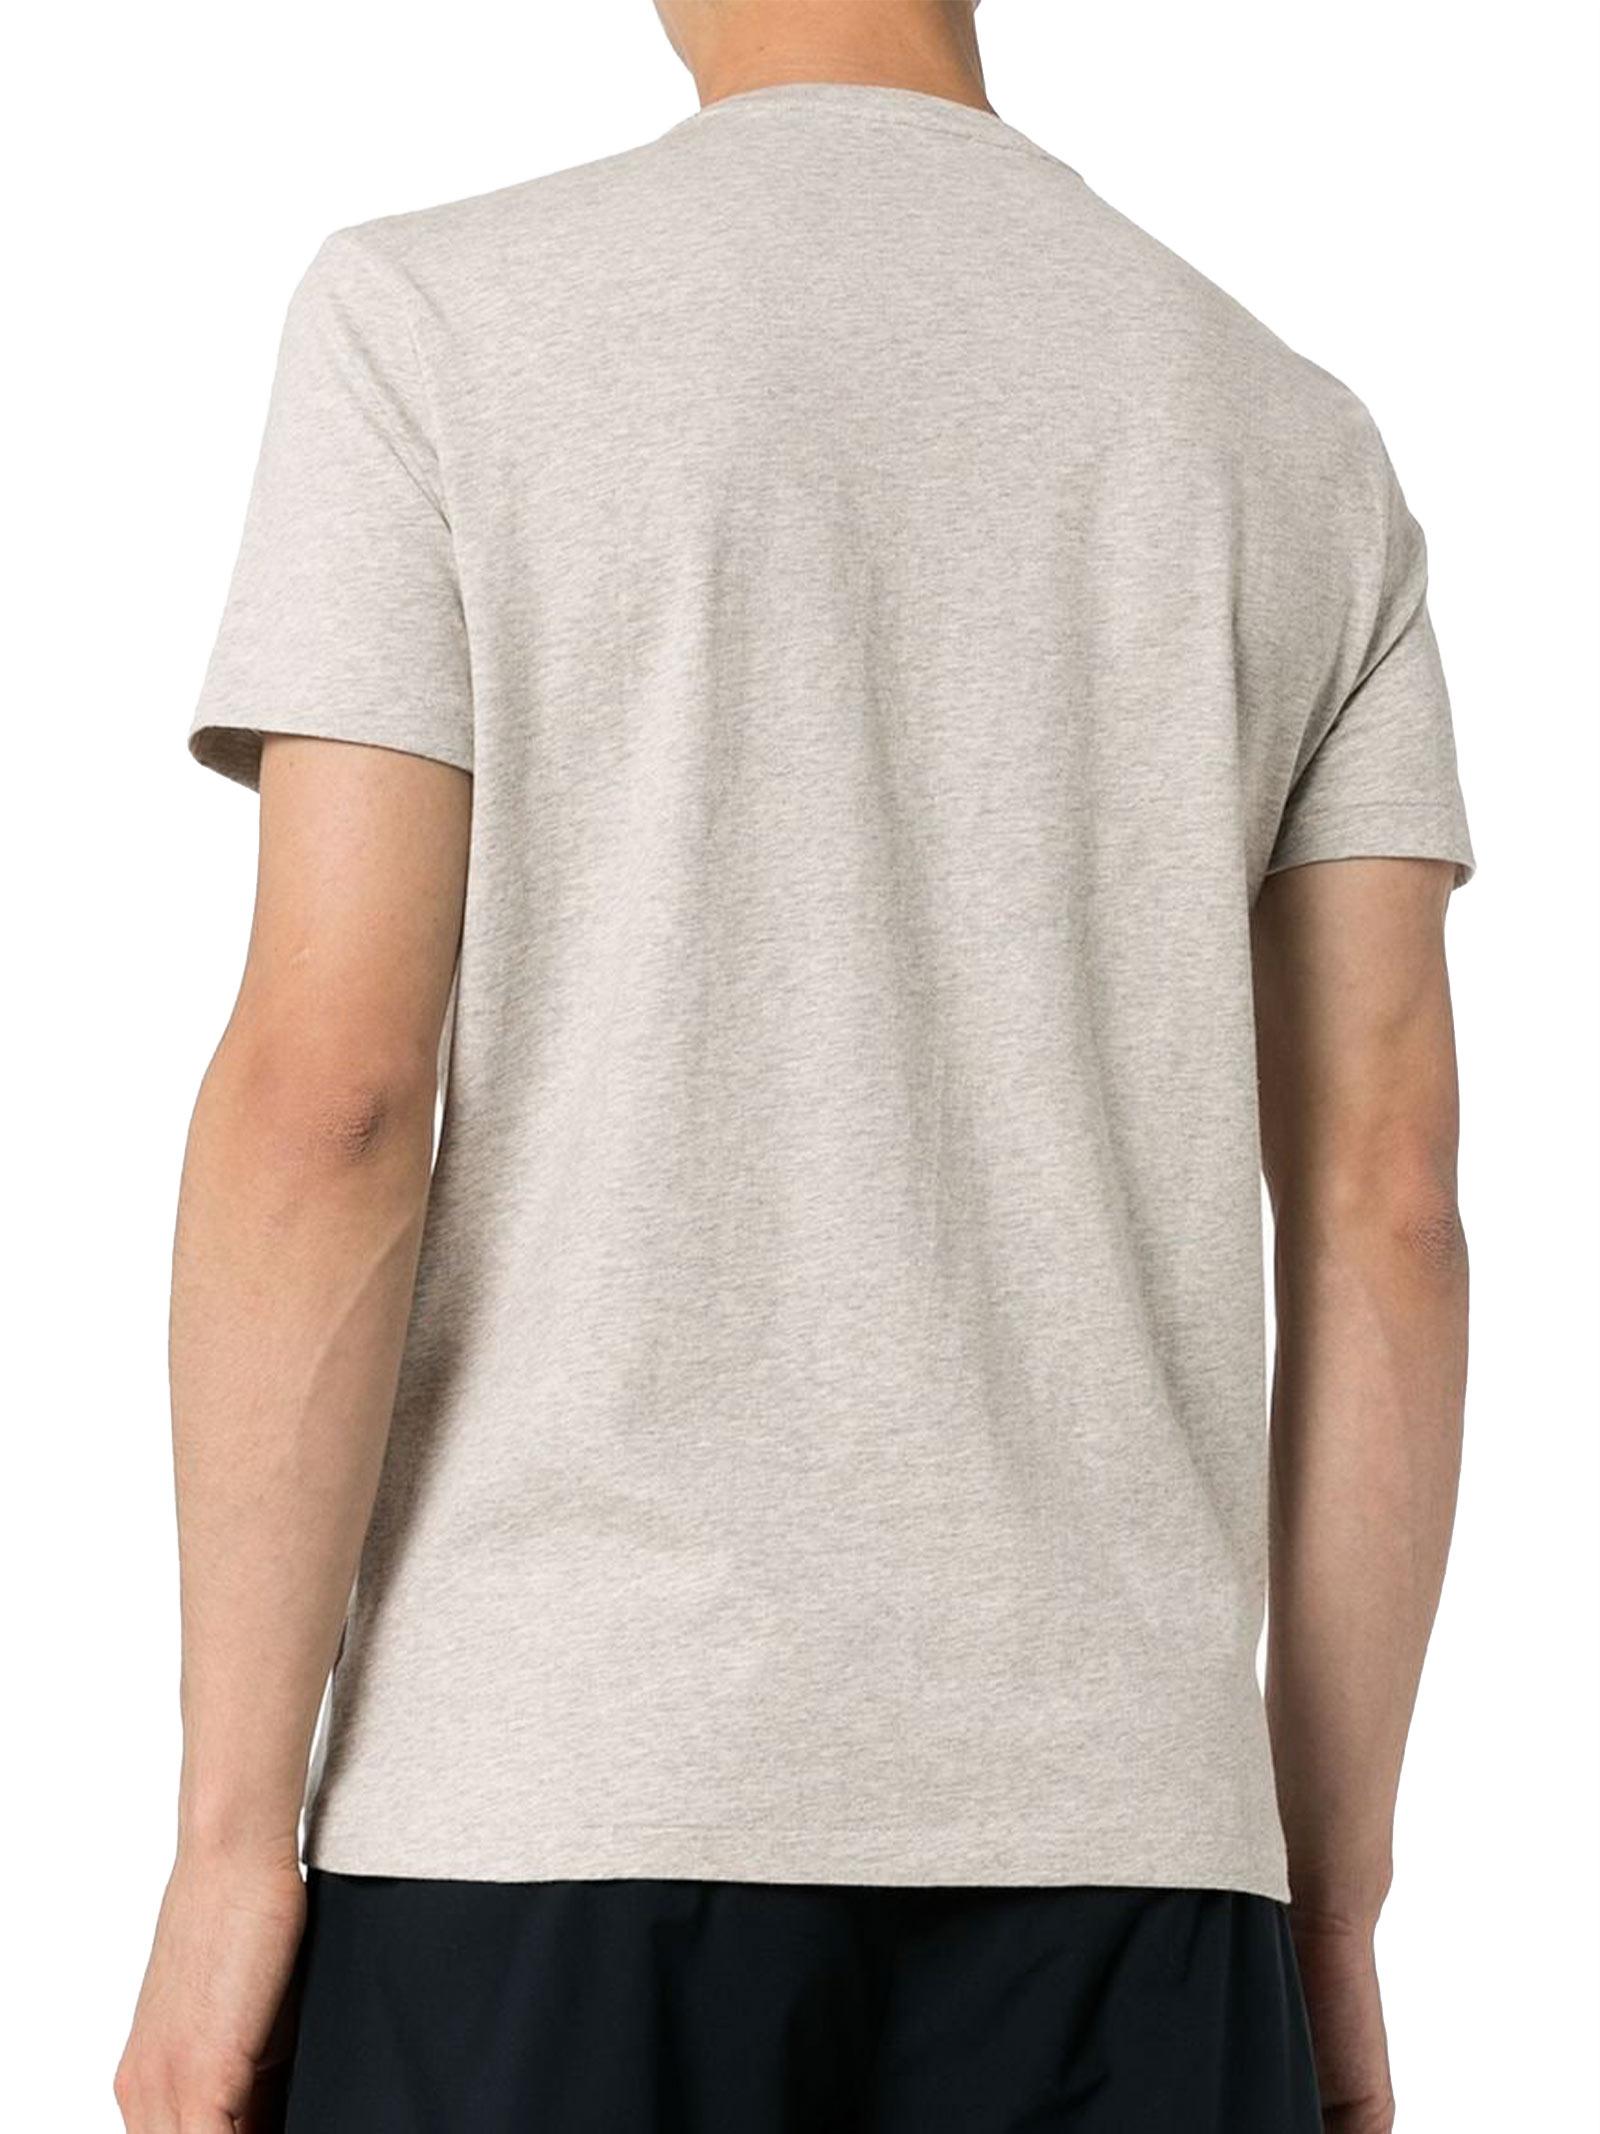 T-shirt girocollo con logo RALPH LAUREN   T-shirt   710-680785002